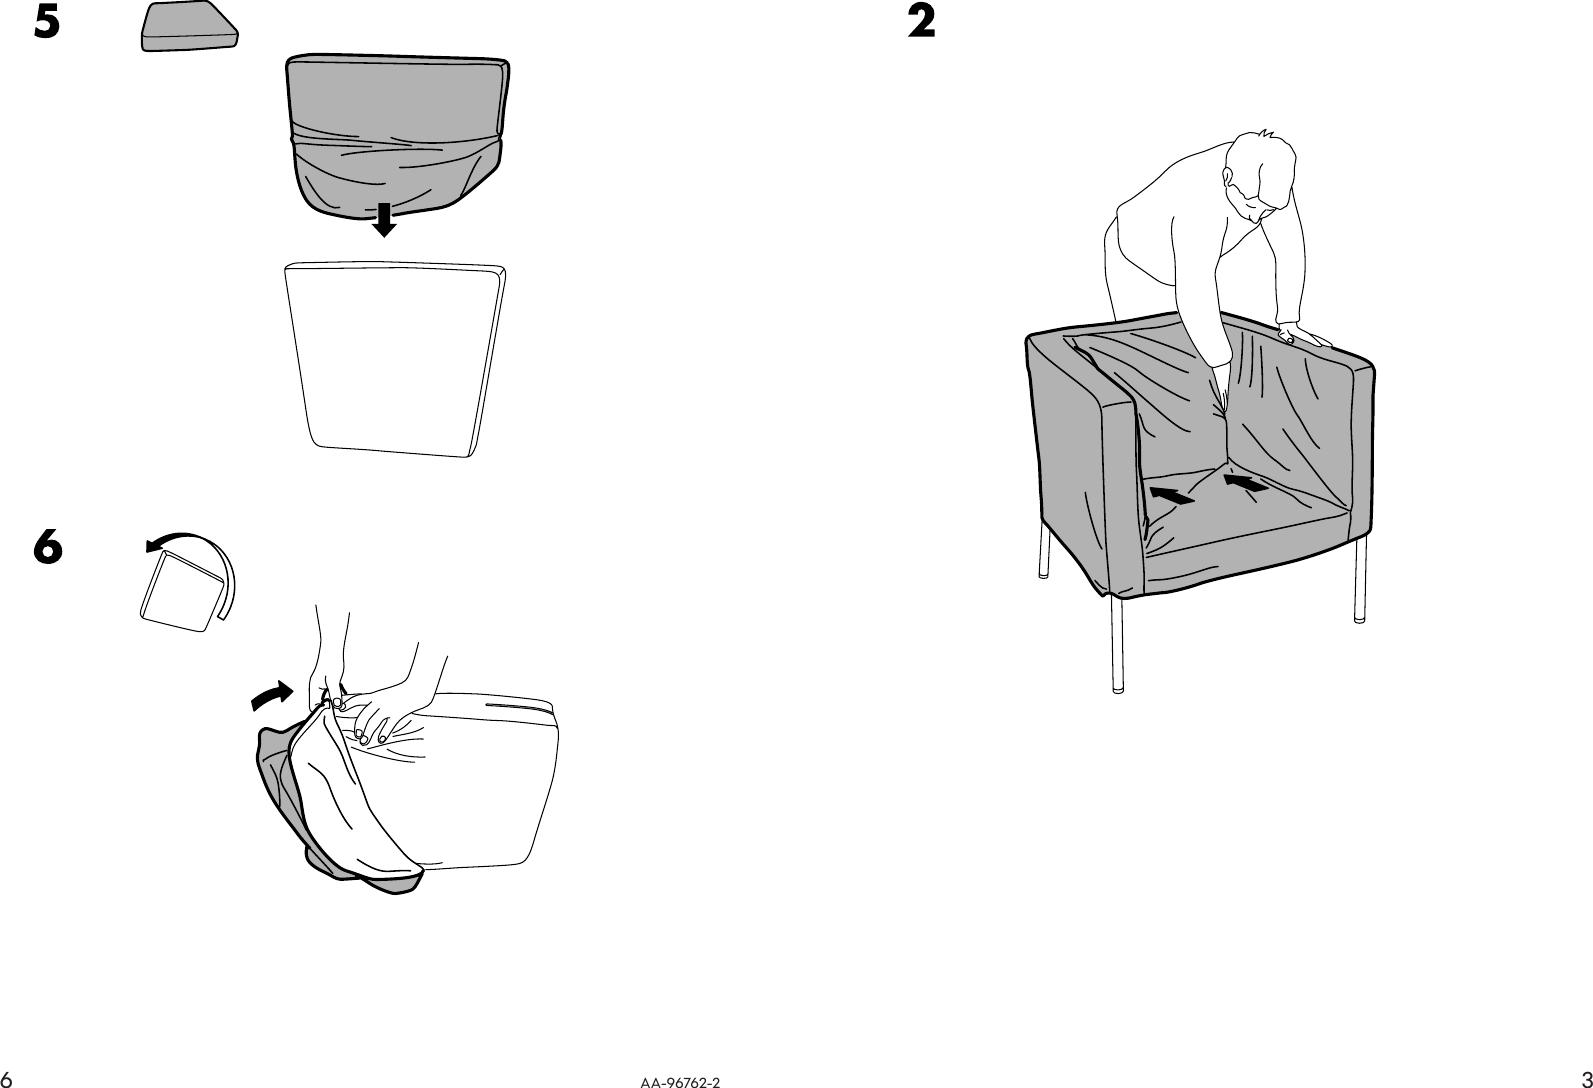 Miraculous Ikea Klappsta Chair Cover Assembly Instruction Inzonedesignstudio Interior Chair Design Inzonedesignstudiocom